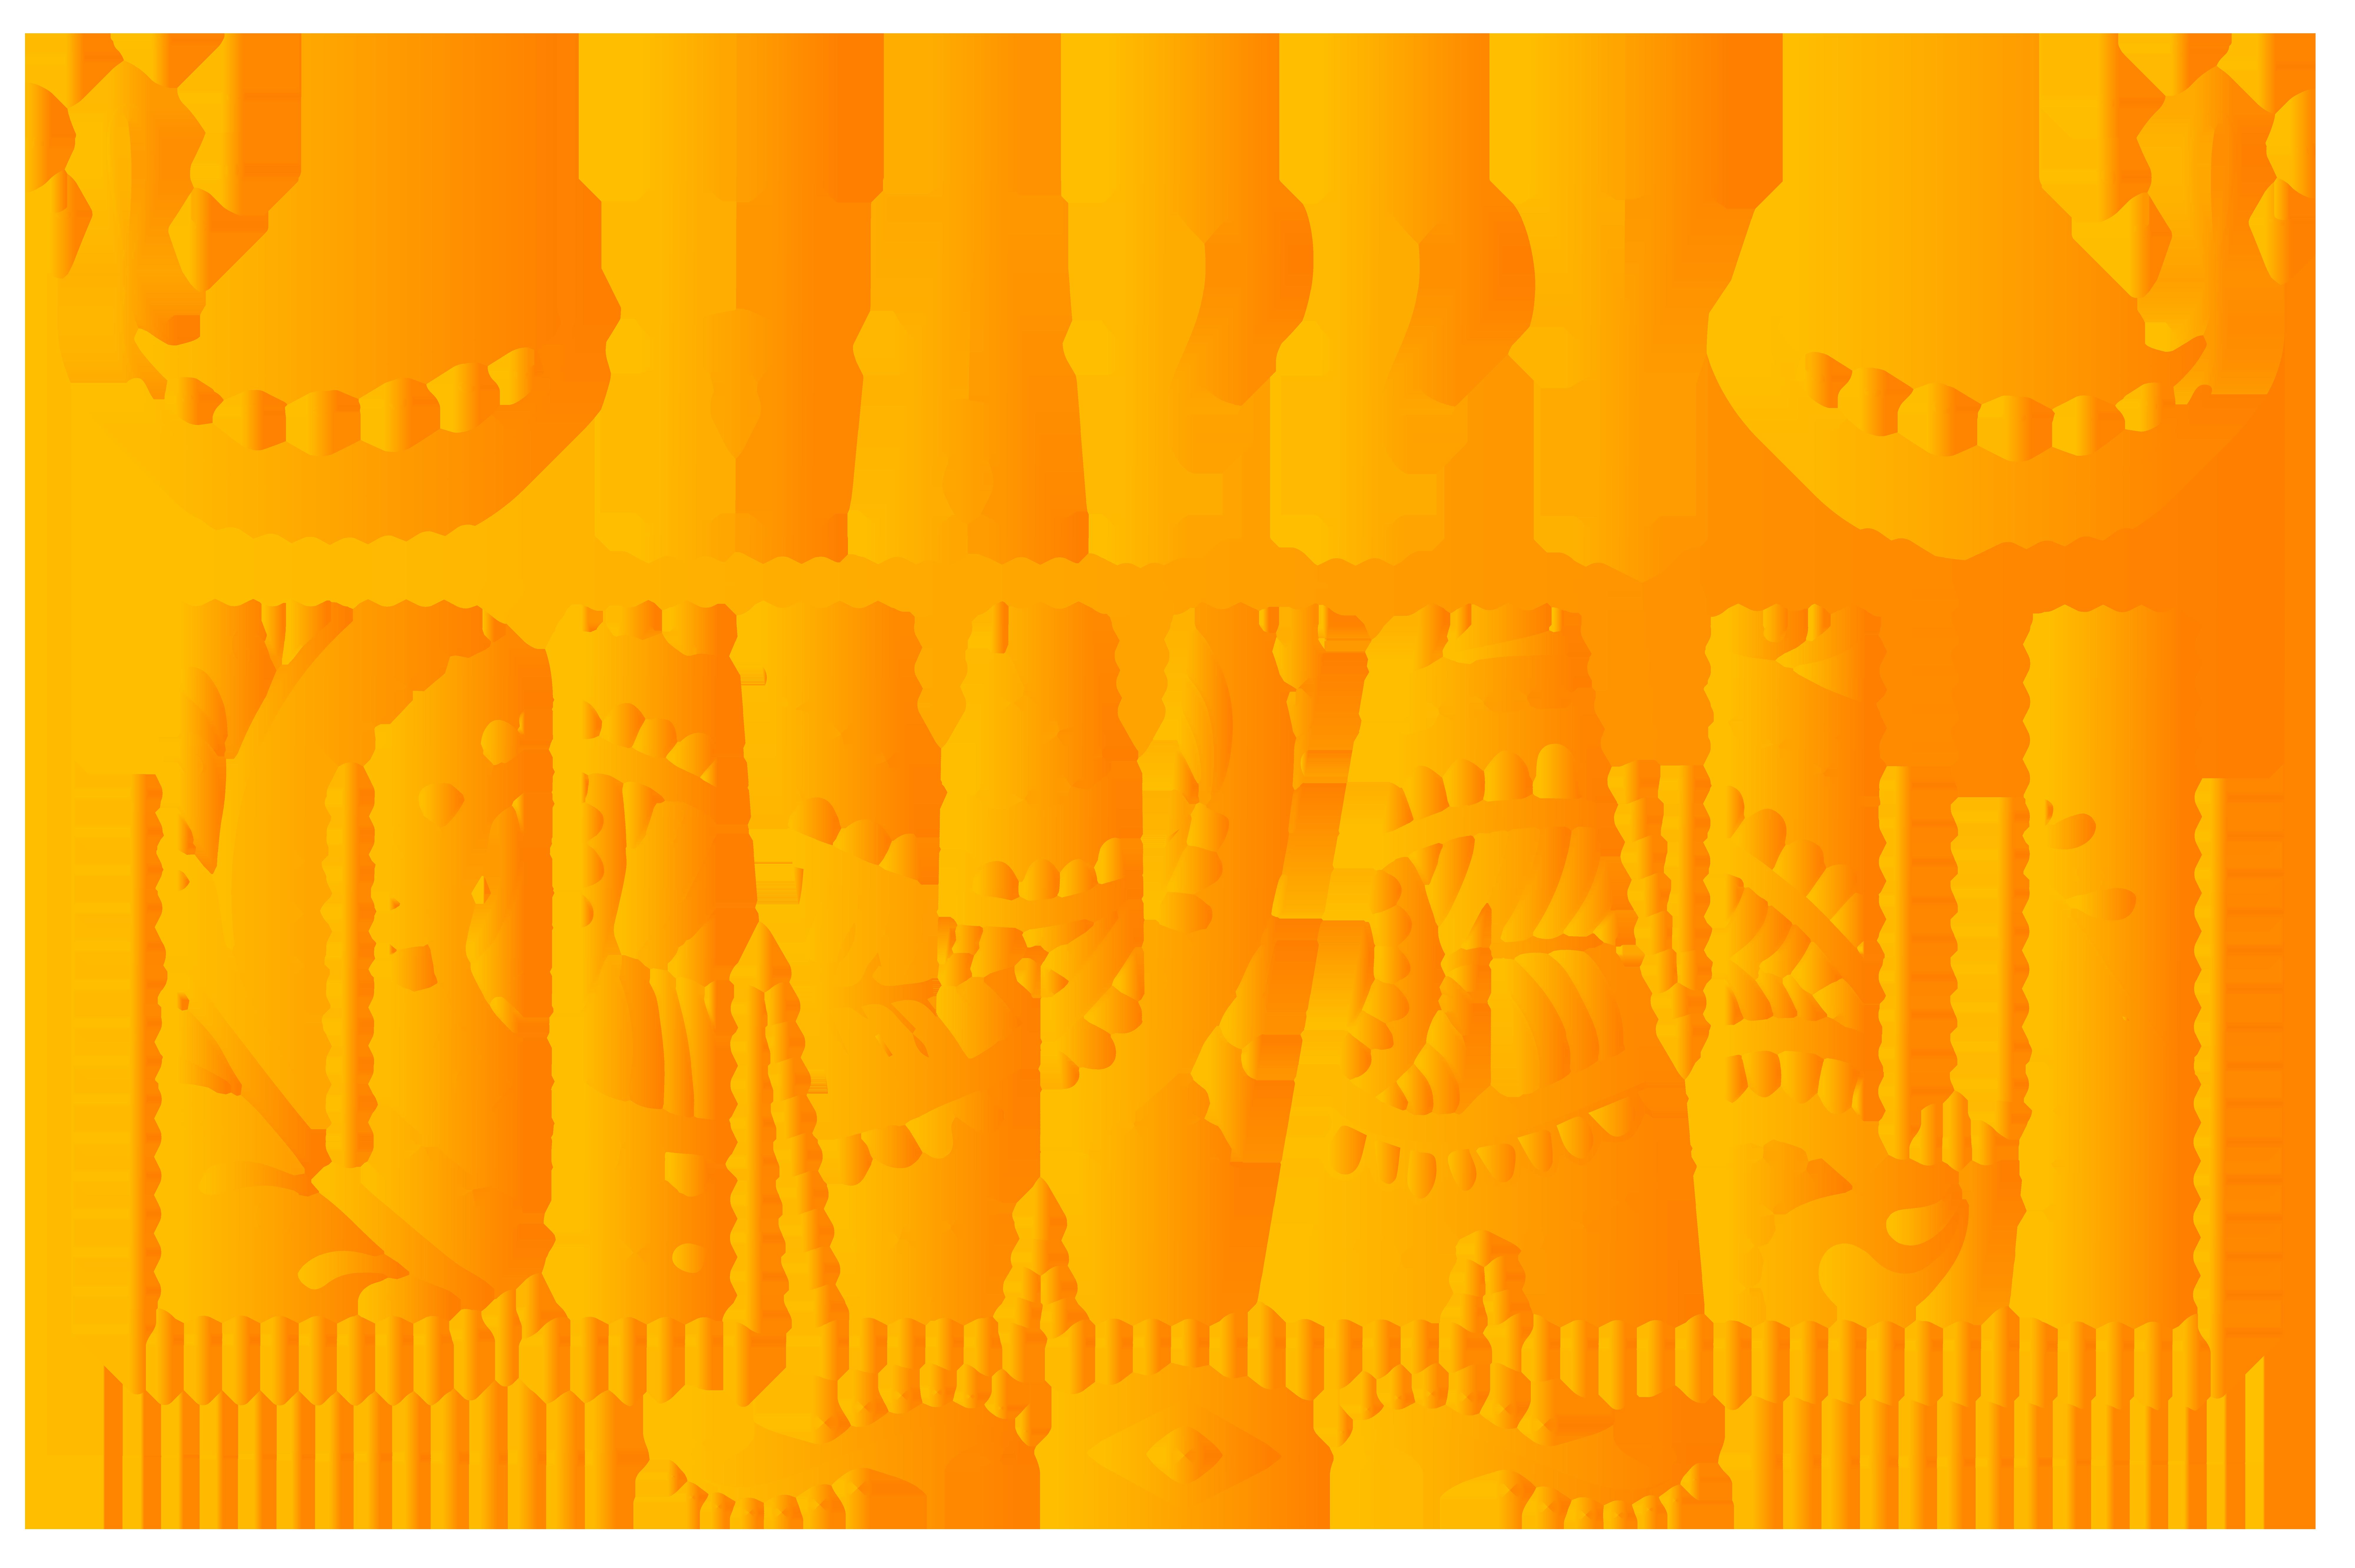 Happy Diwali Orange Text Transparent Clip Art Image.